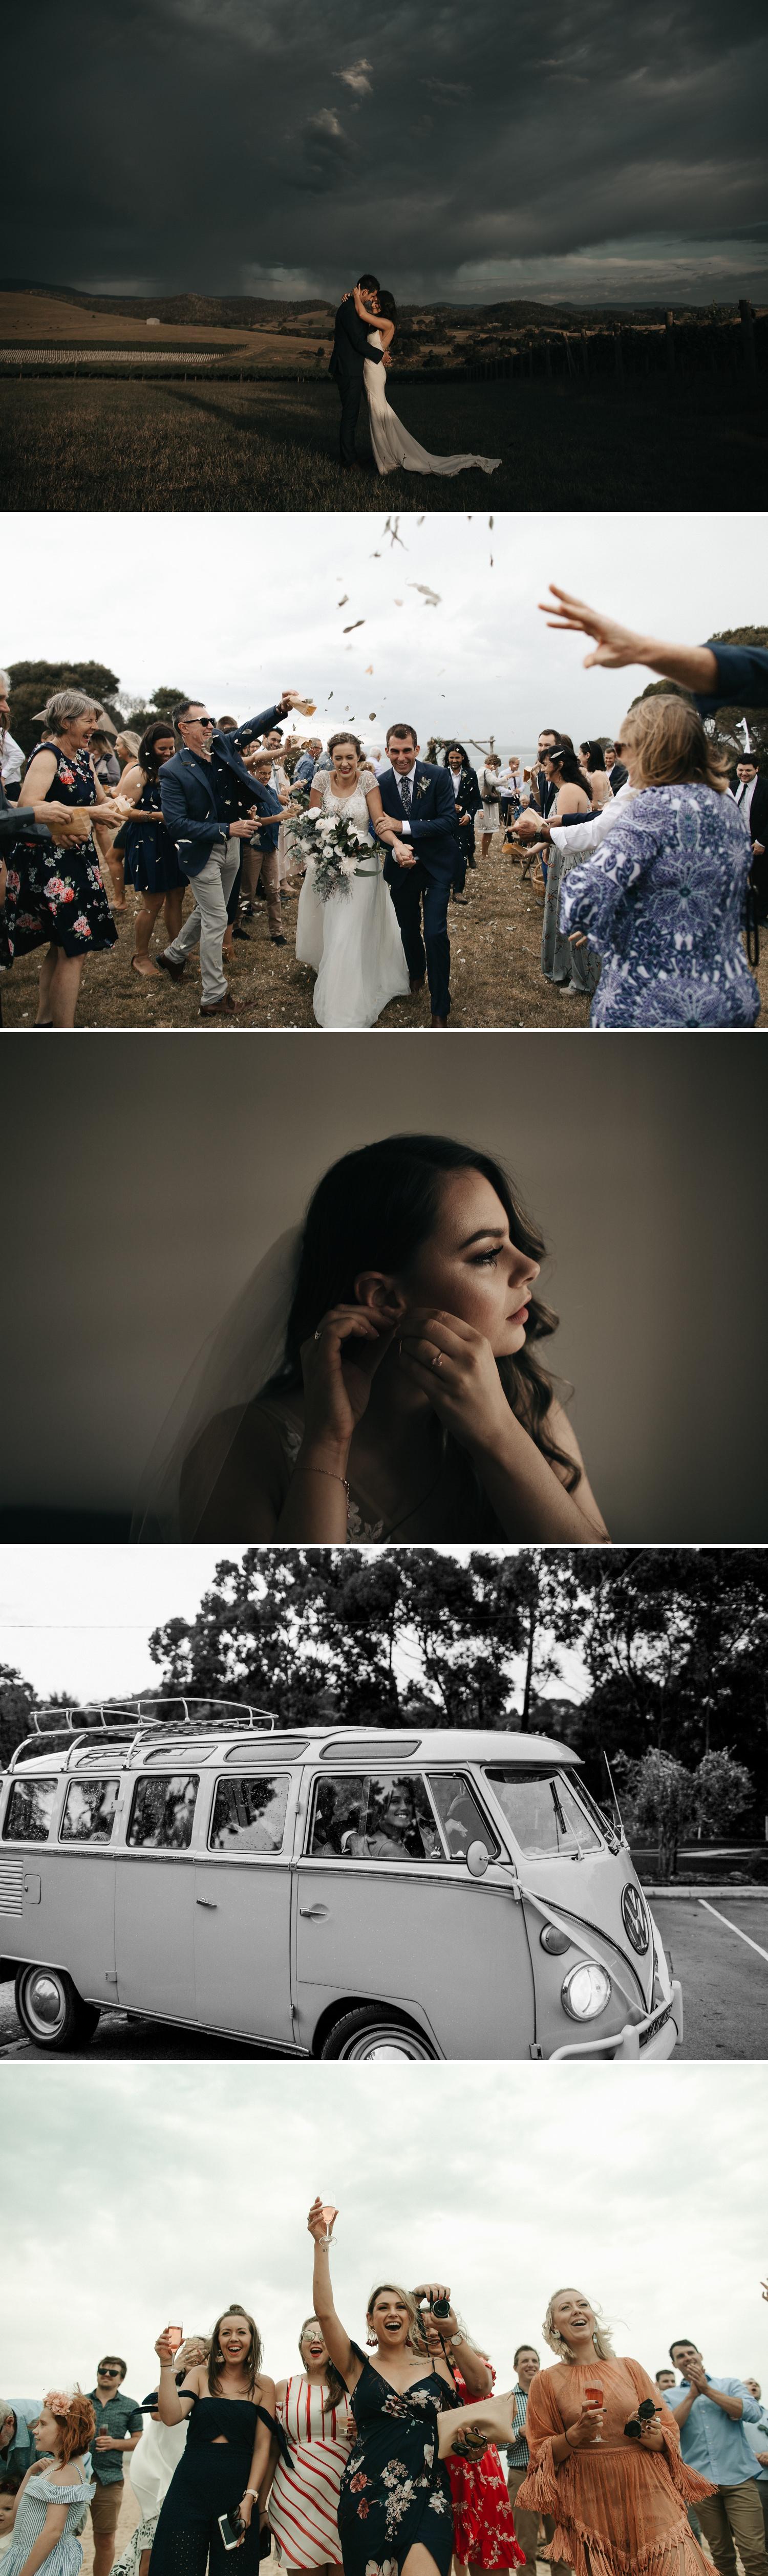 relaxed-wedding-photographer-melbourne_0010.jpg